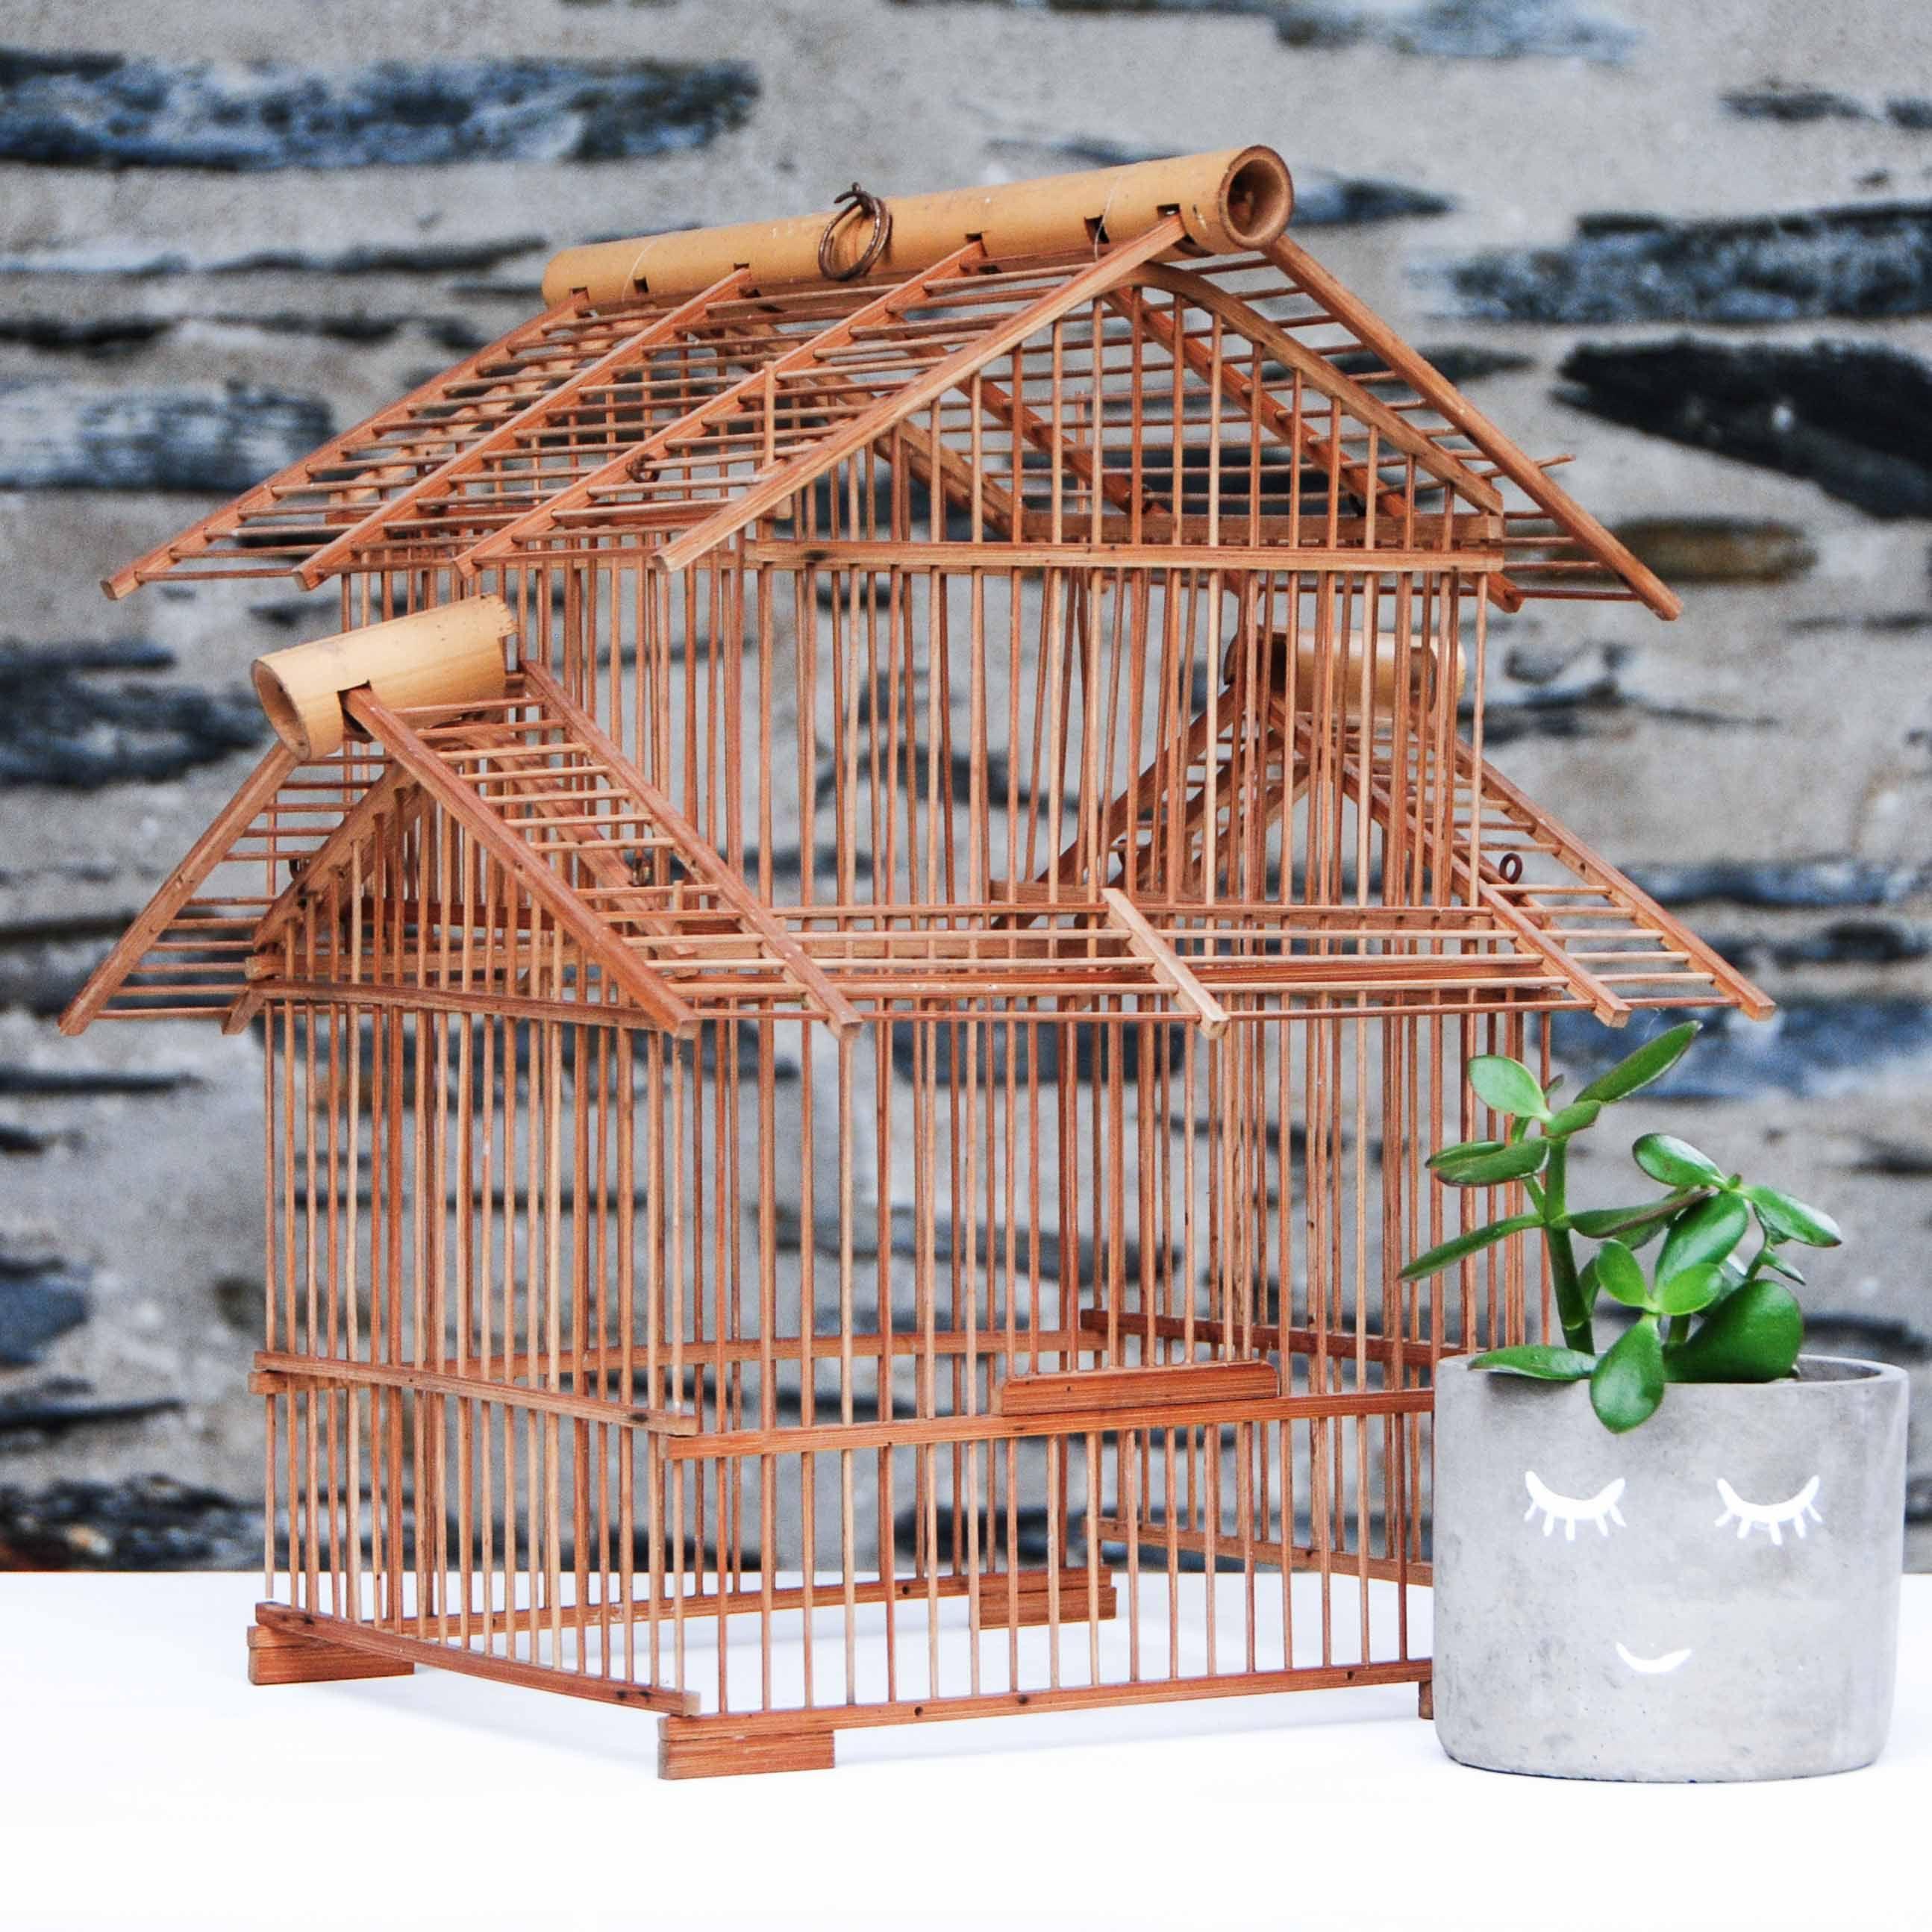 Cage en Bambou | Esprit #brocante | 38€ sur GrisGroseille.com